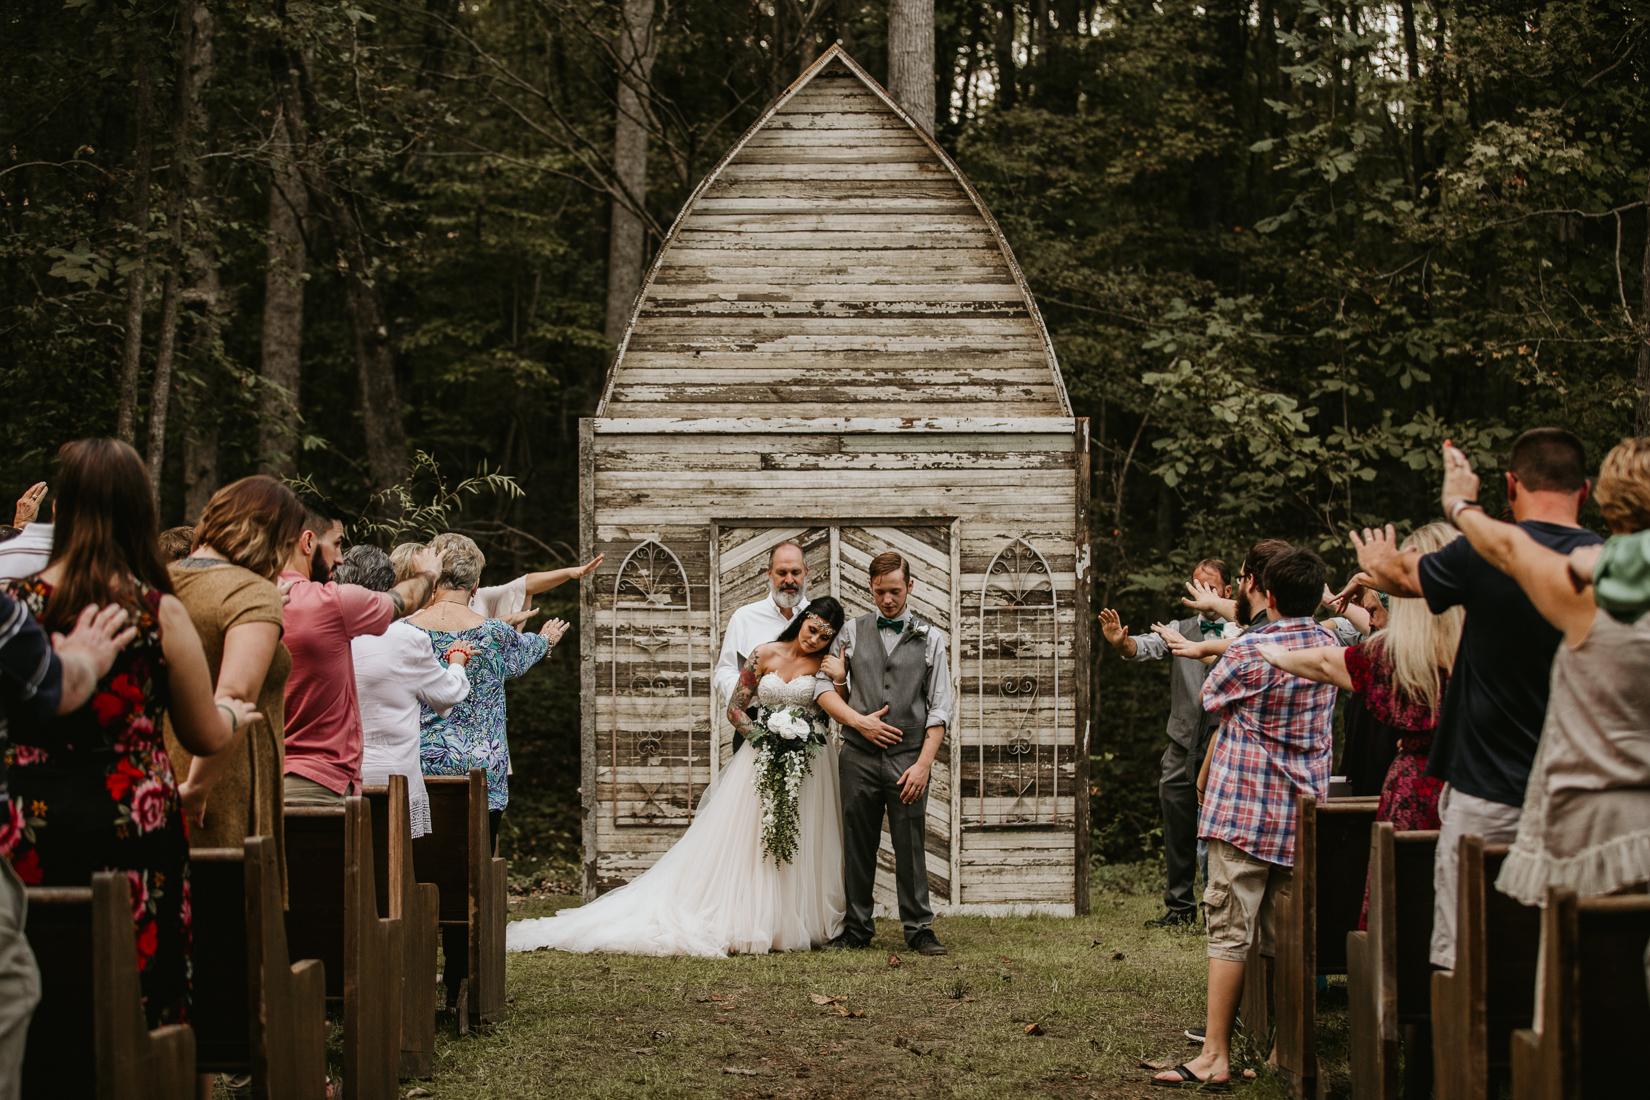 olivia_zay_wedding_09_2018-9756.jpg